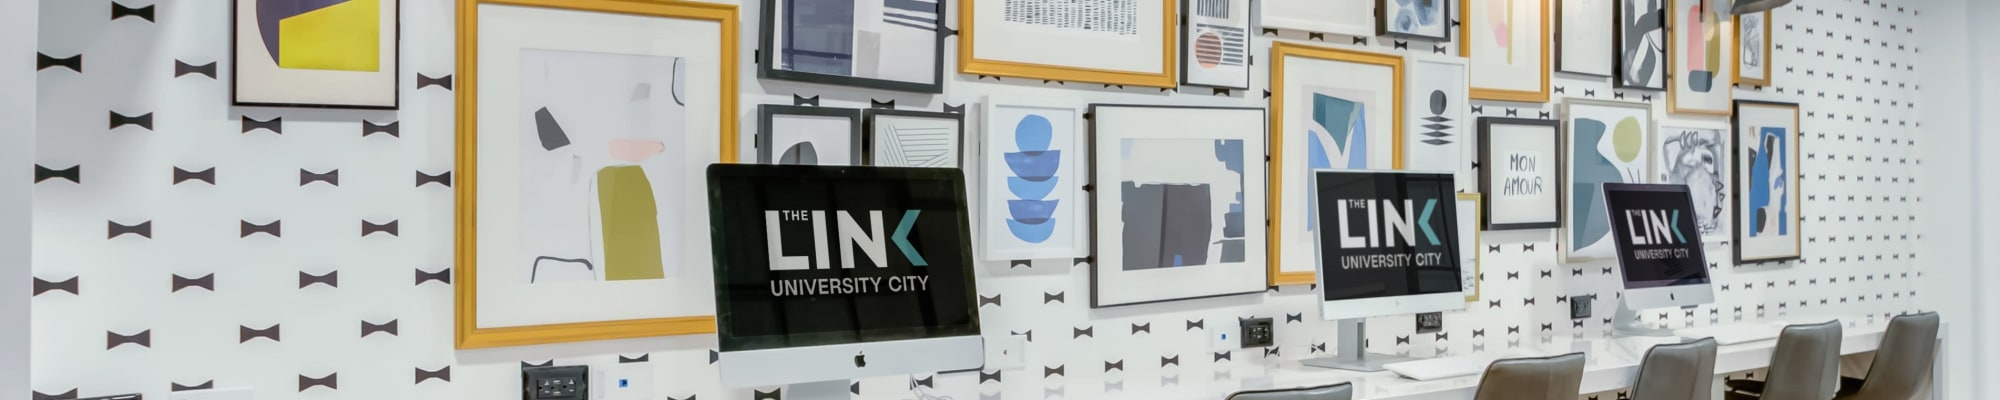 Video Tours at The Link University City in Philadelphia, Pennsylvania